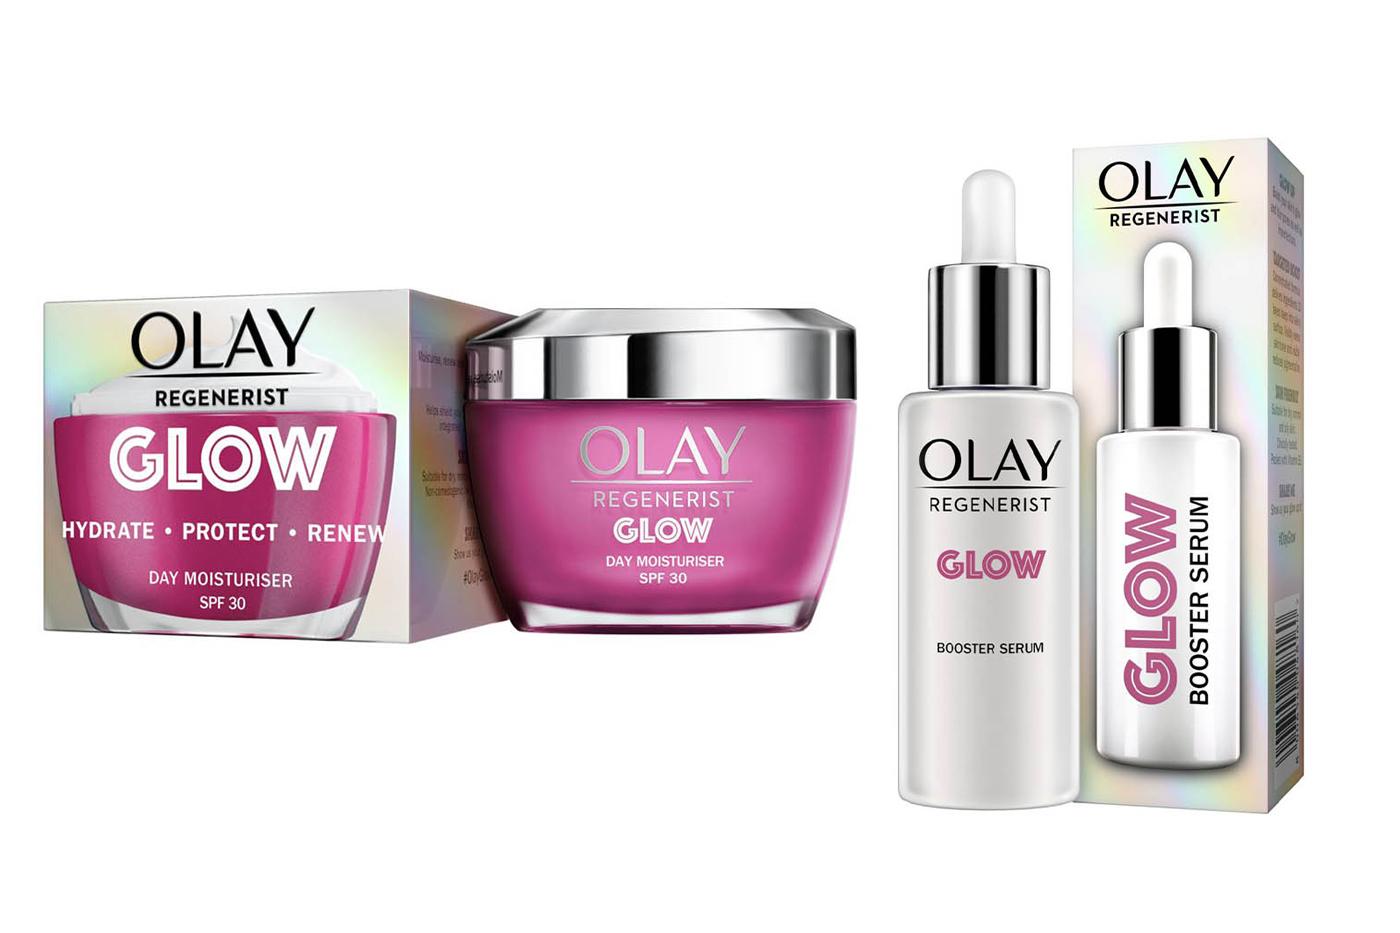 Olay launches Regenerist GLOW range